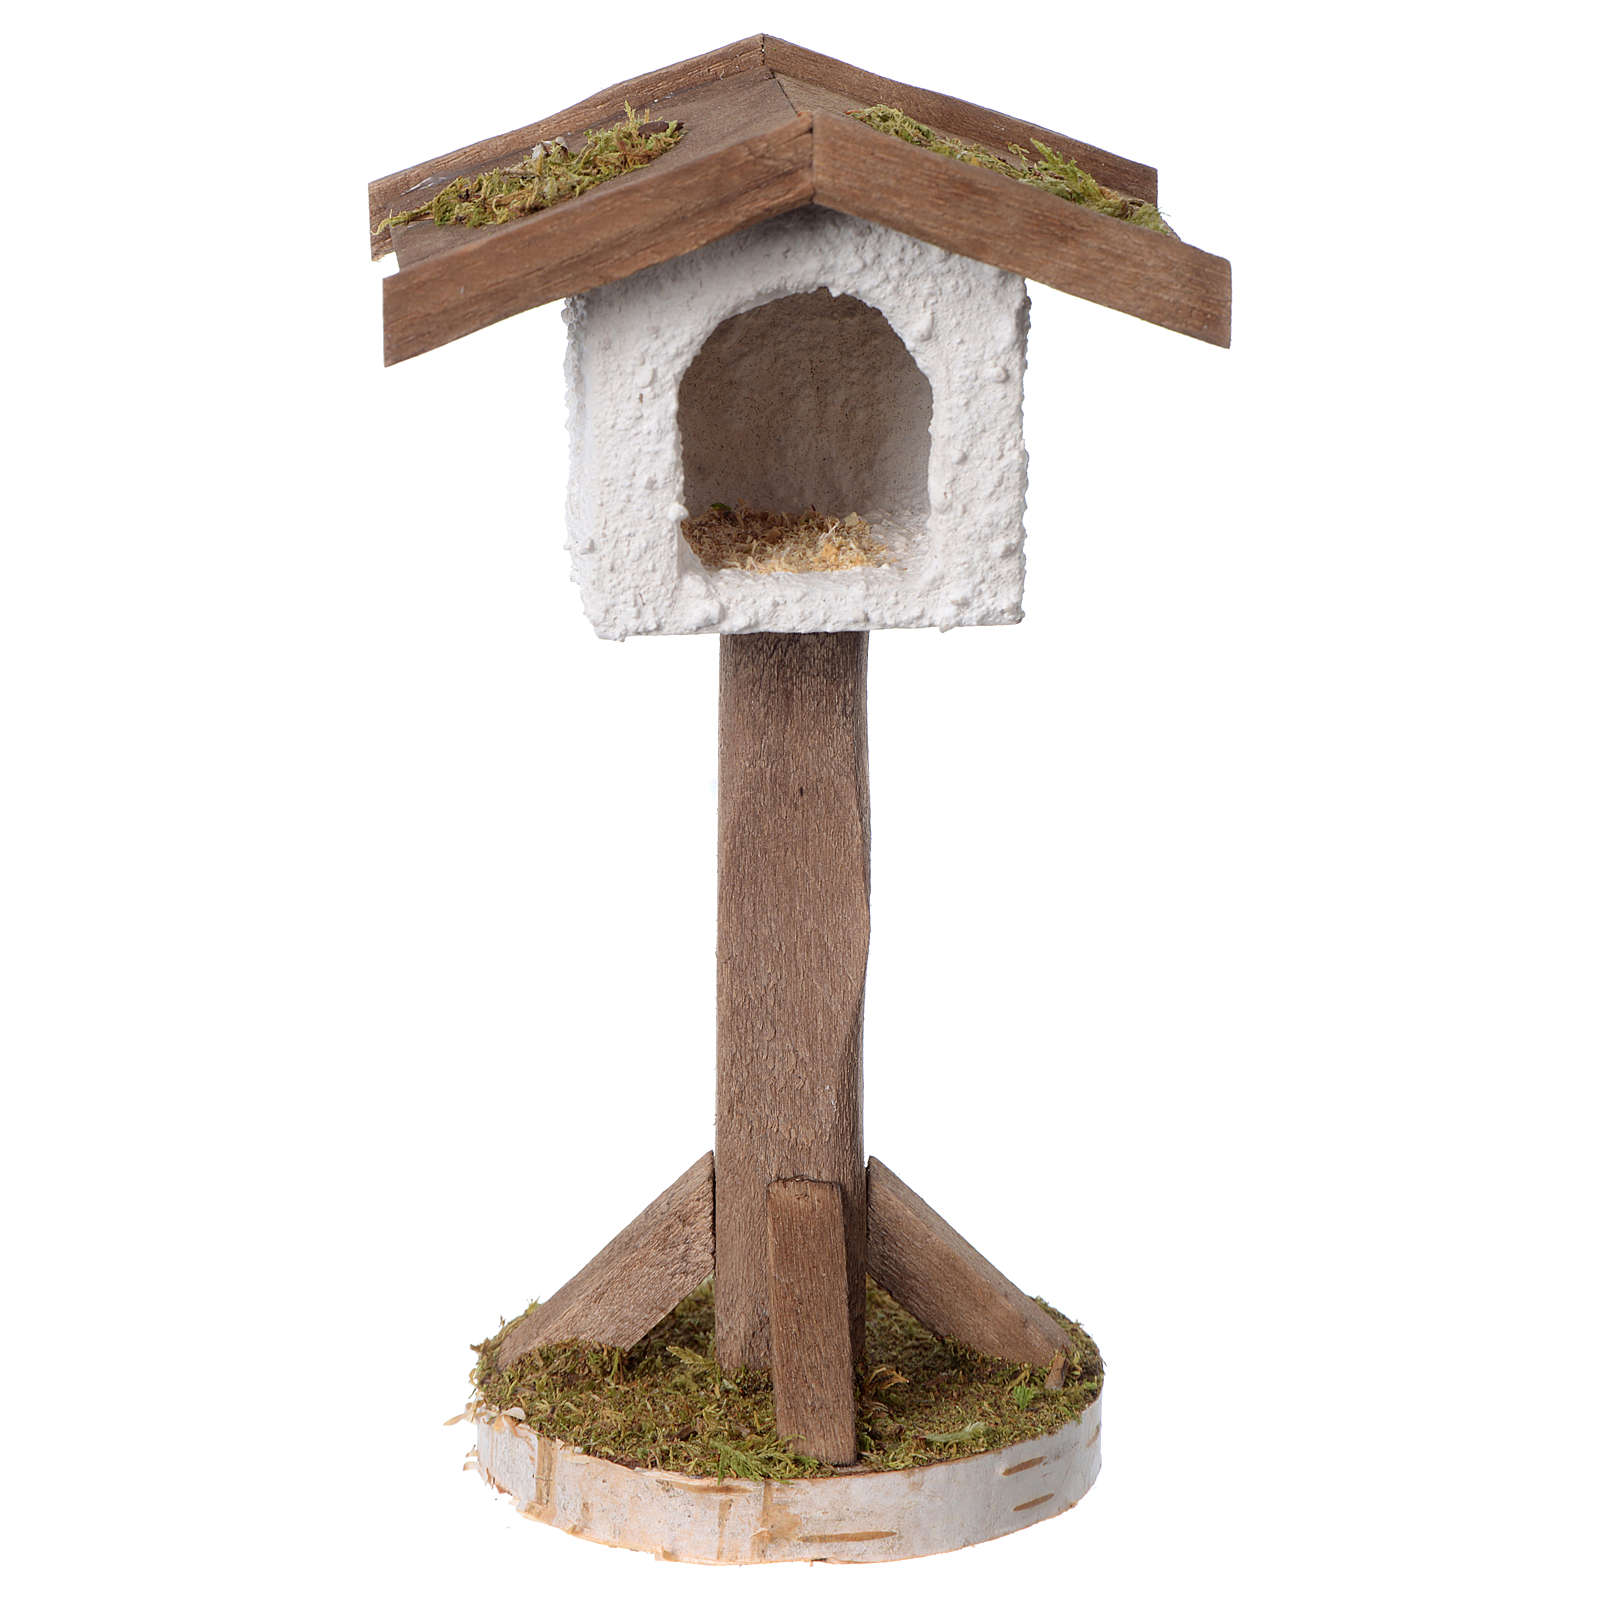 Birdhouse in wood and plaster for 10-12 cm nativity scene 3